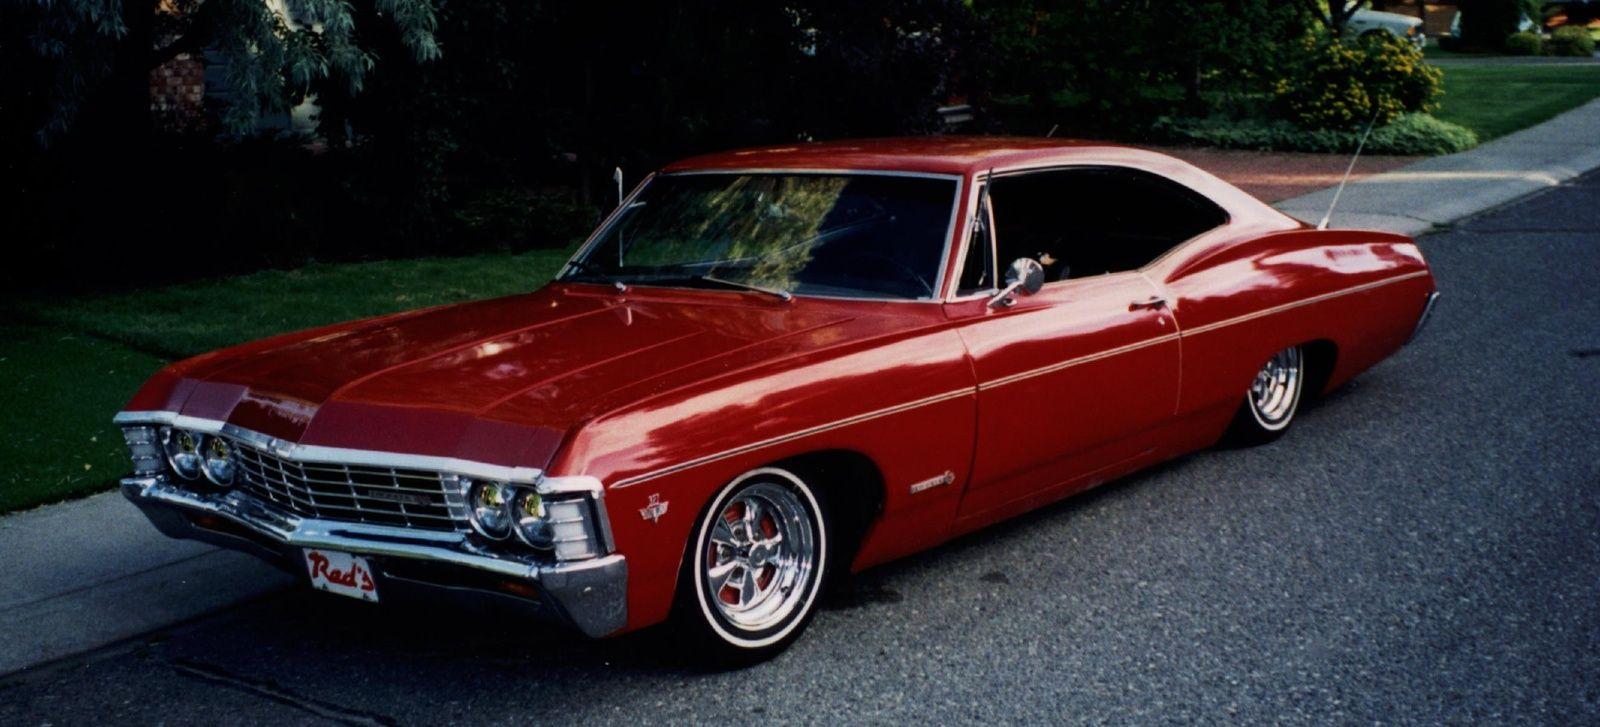 1967 Chevrolet Impala Picture Chevrolet Impala Chevy Impala